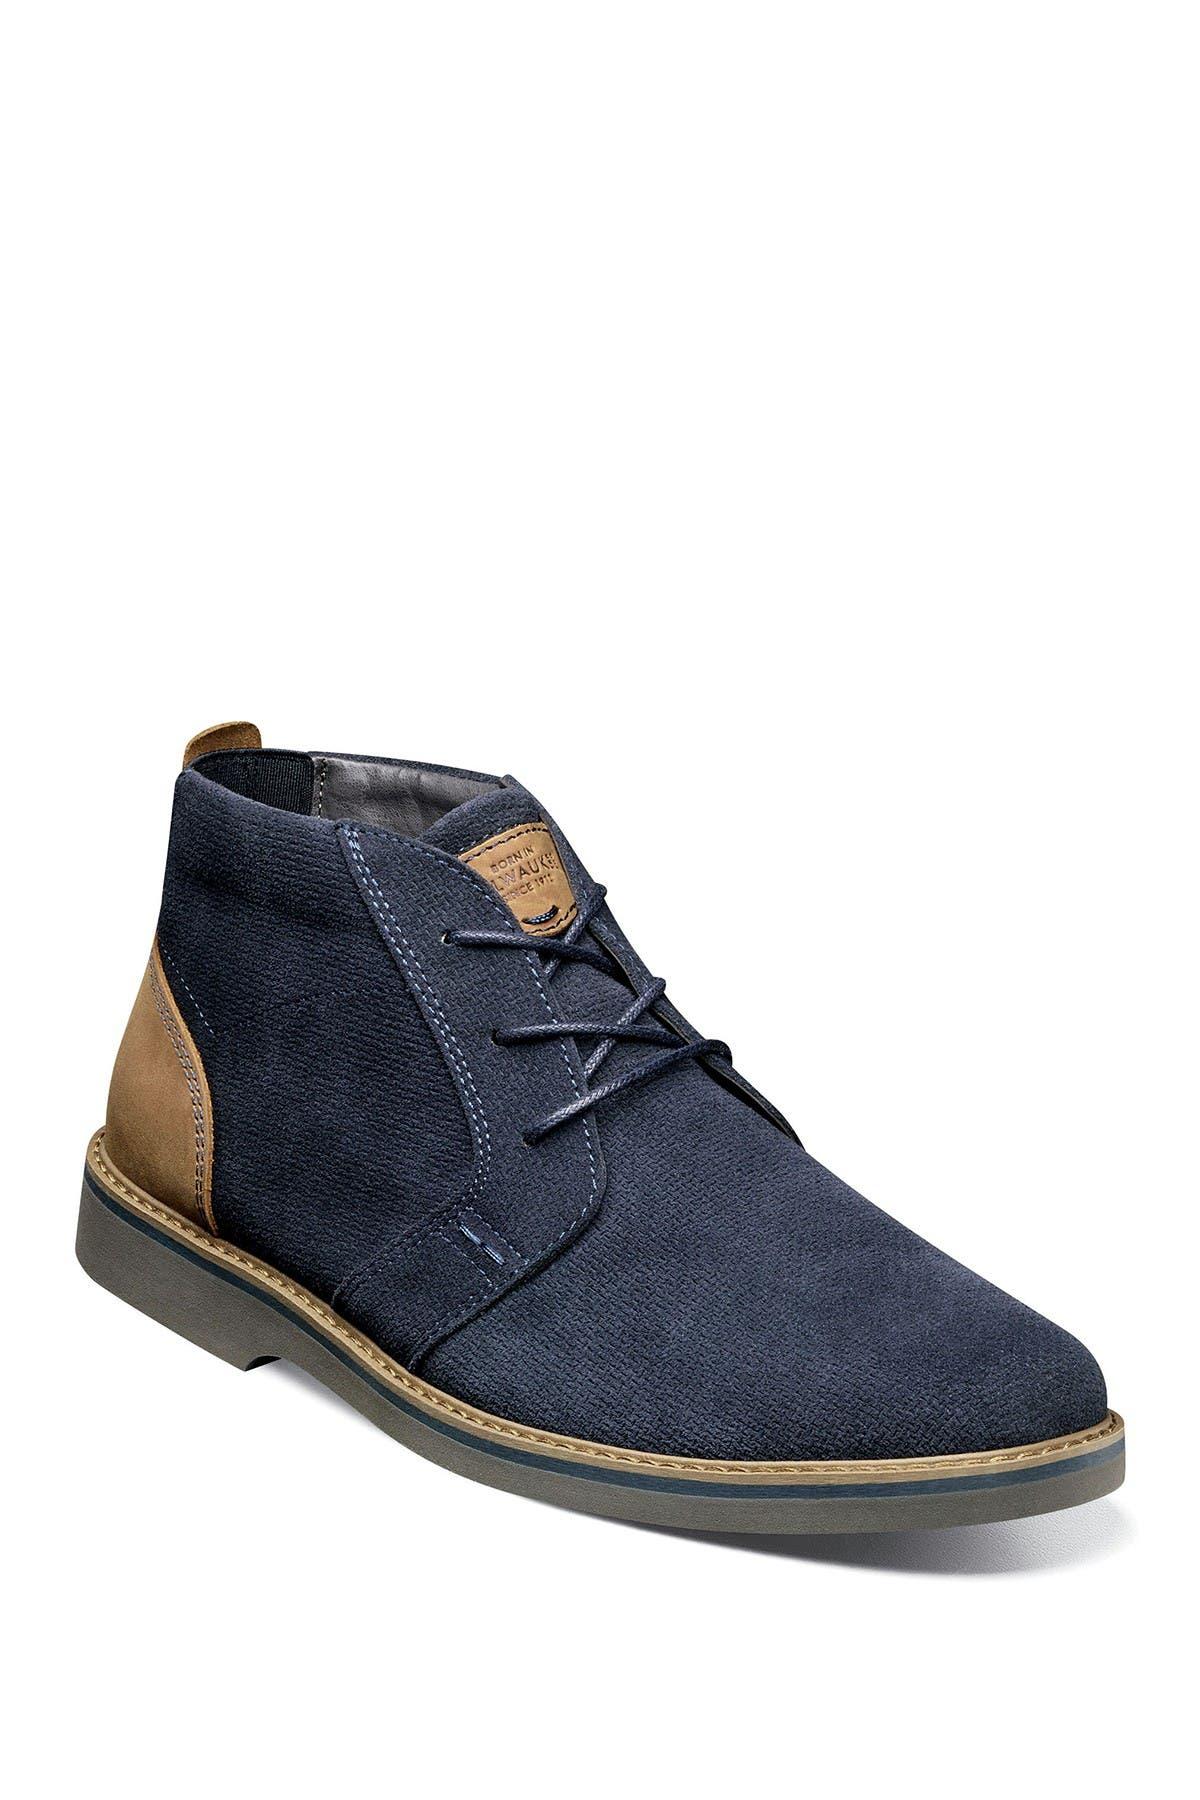 Image of NUNN BUSH Barklay Leather Plain Toe Chukka Boot